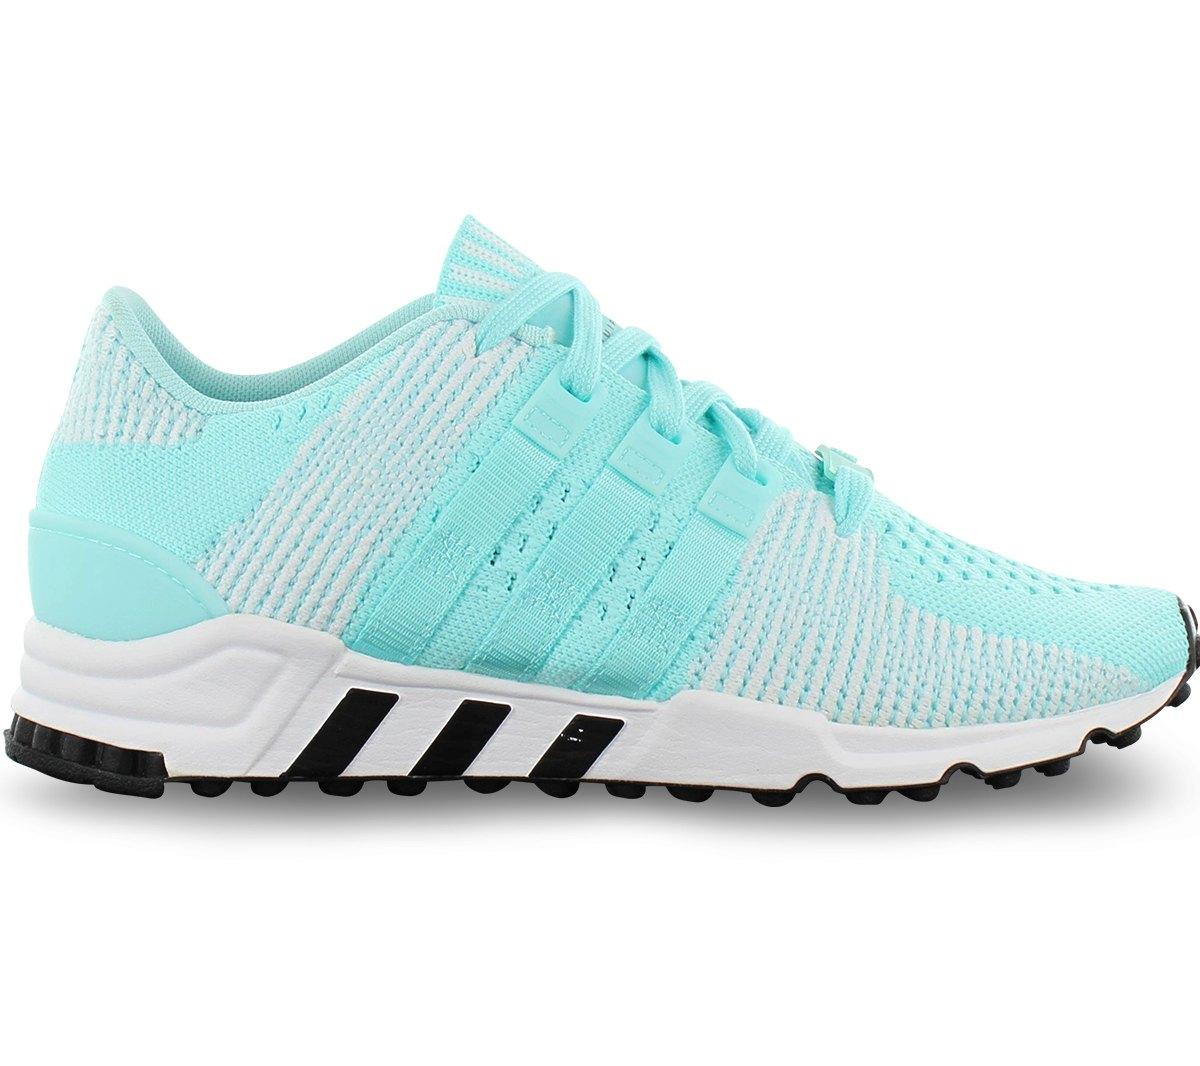 buy online 31679 2622b Details about Adidas Eqt Equipment Support RF Pk W Primeknit Women's  Sneaker BZ0009 Shoes New